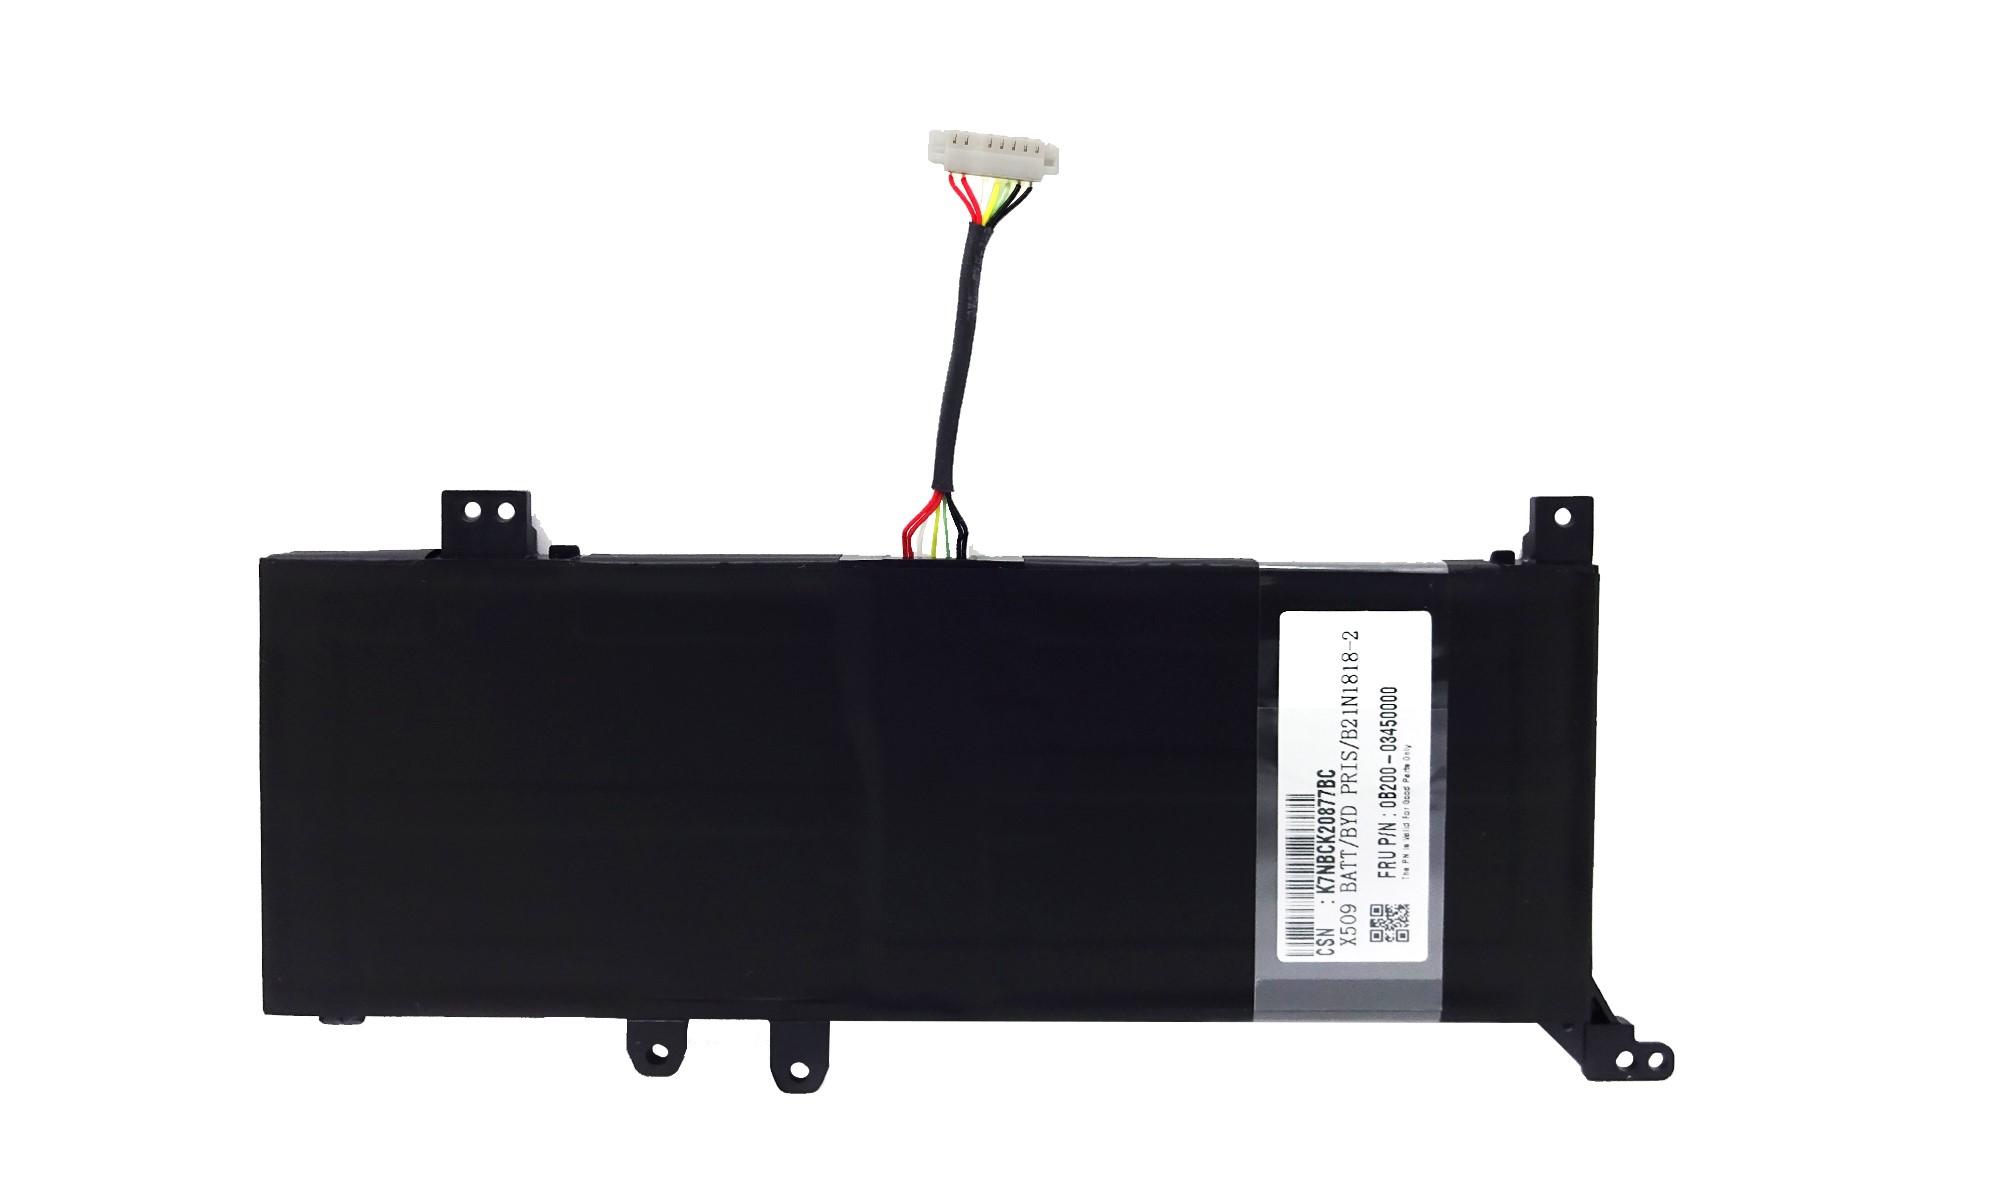 Baterie originala laptop ASUS X409BA, X409DA, X409DJ, X409DL, X409FA, X409FB, X409FJ, X409FL, X409UA, X409UJ, model B21N1818-2